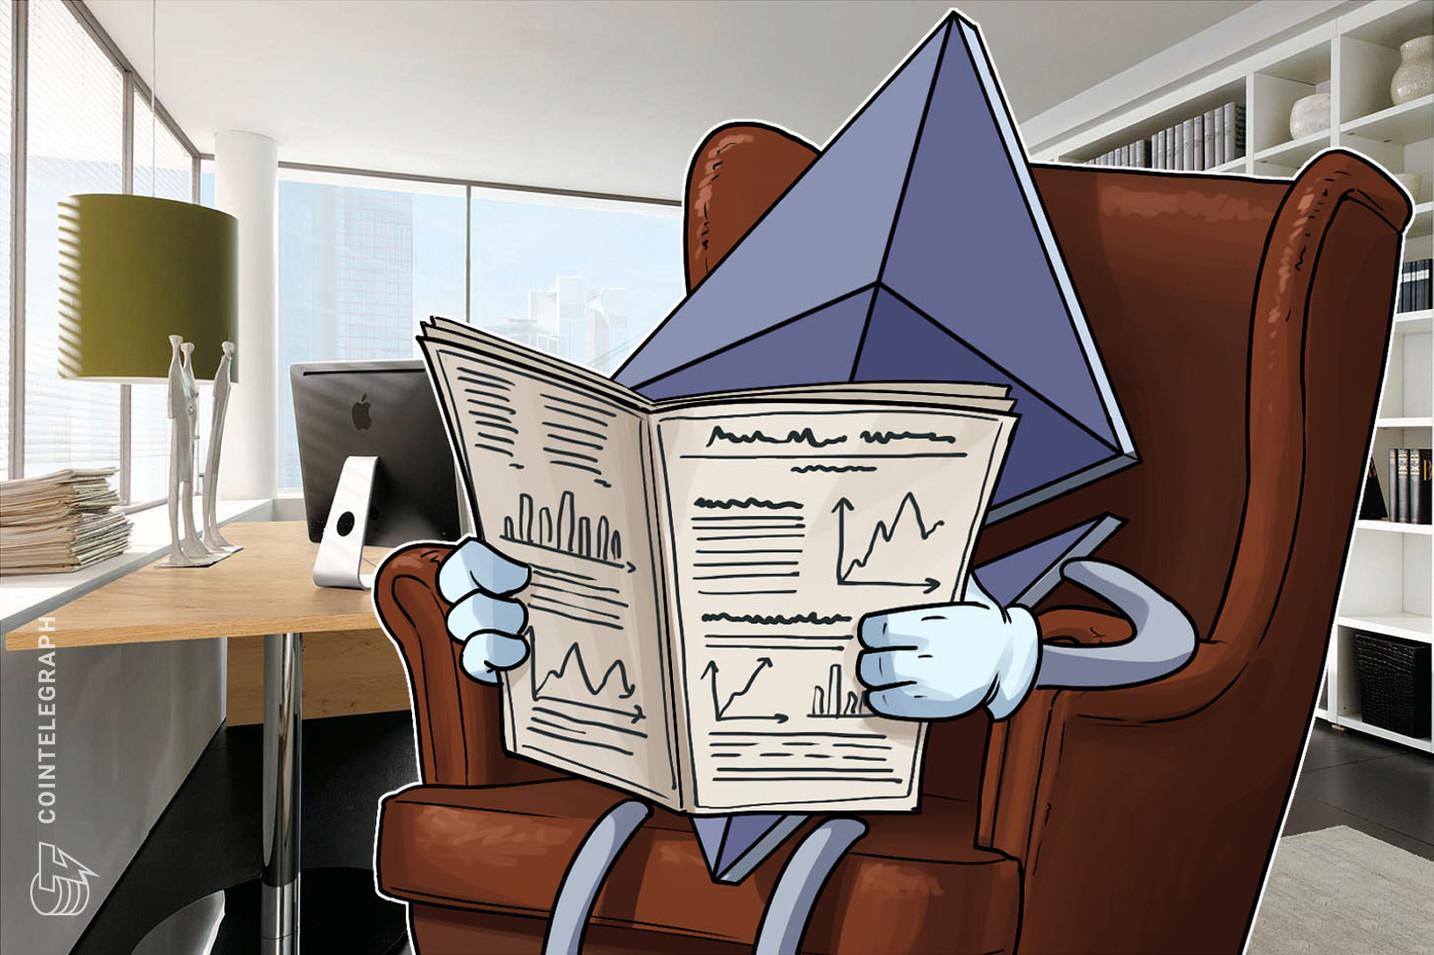 Desarrolladores centrales de Ethereum retrasan 'bomba de dificultad', reducen recompensa de bloques a 2 ETH